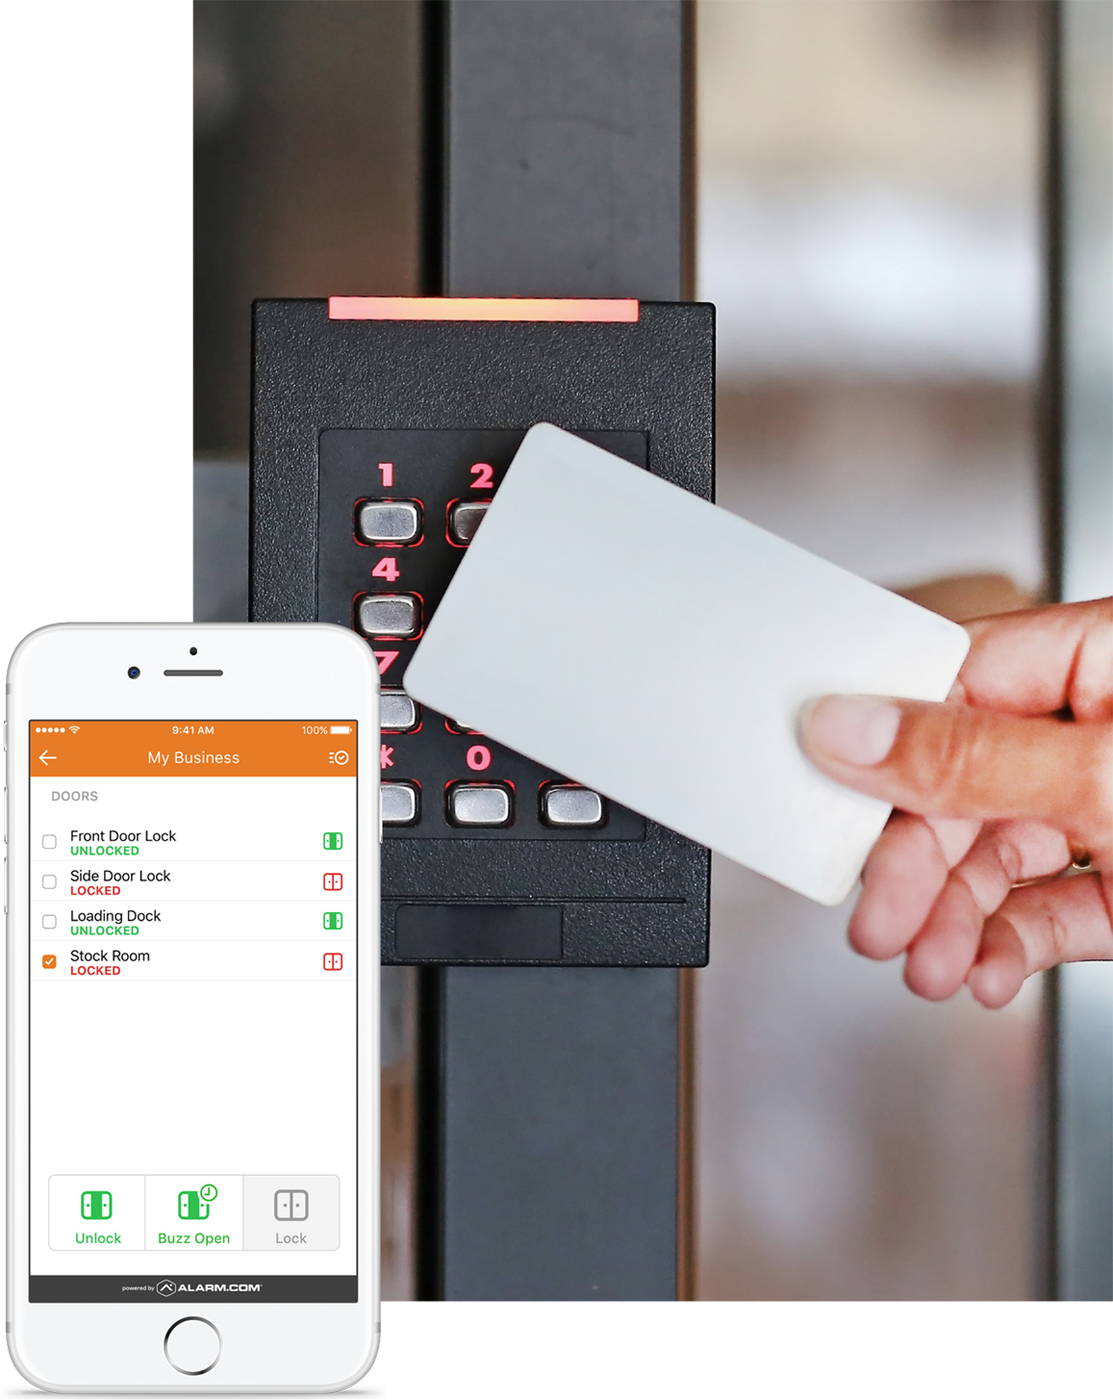 Alarm.com Keypad and Mobile App